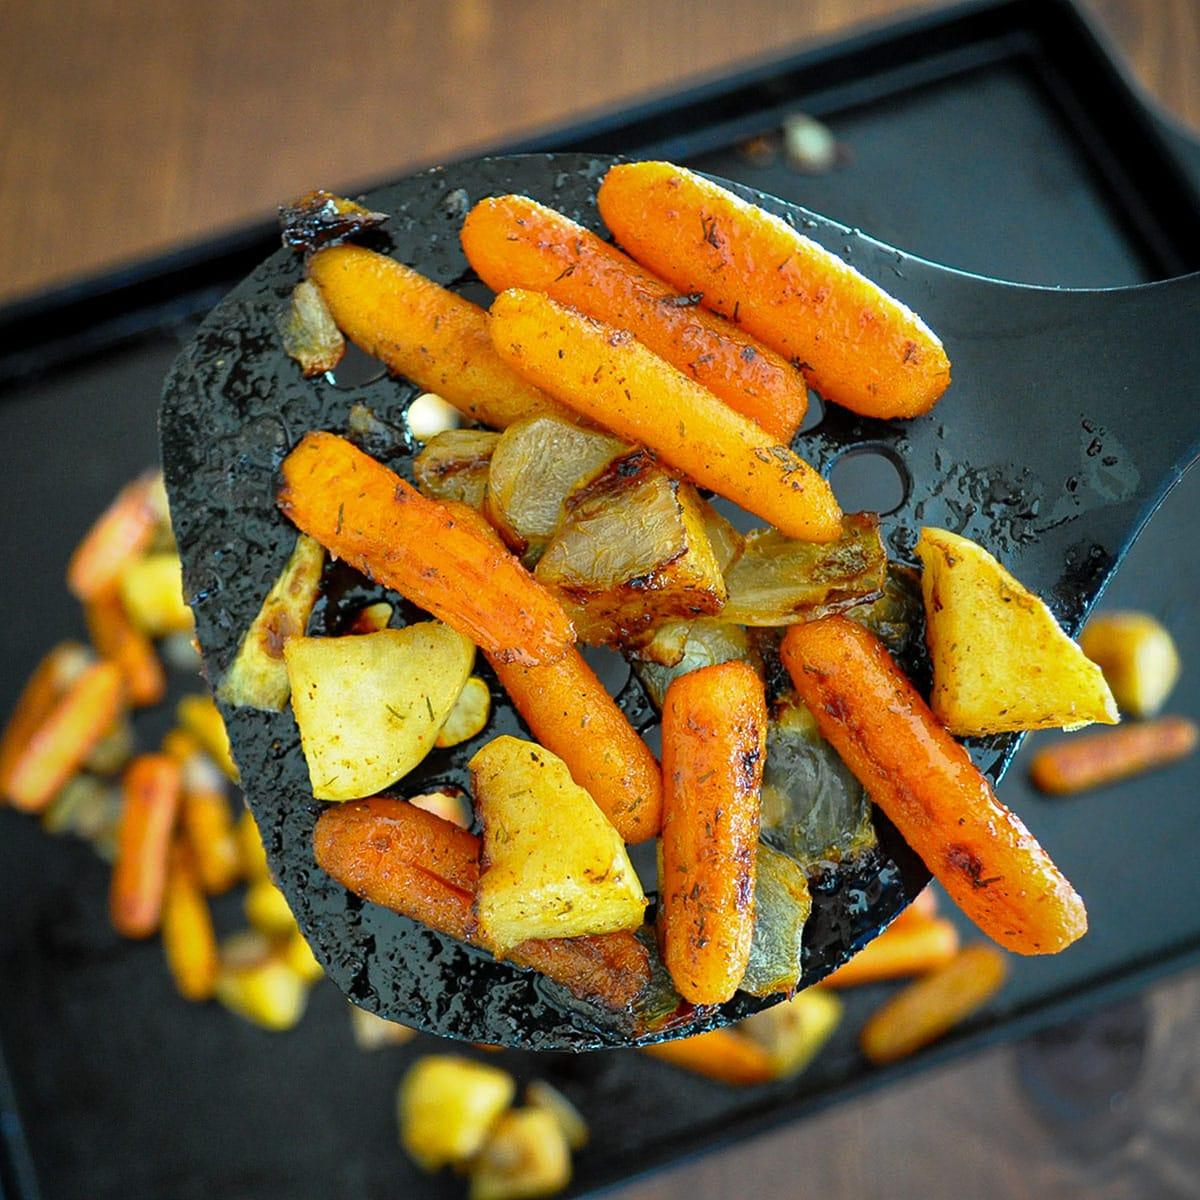 roasted carrots on a spatula close up